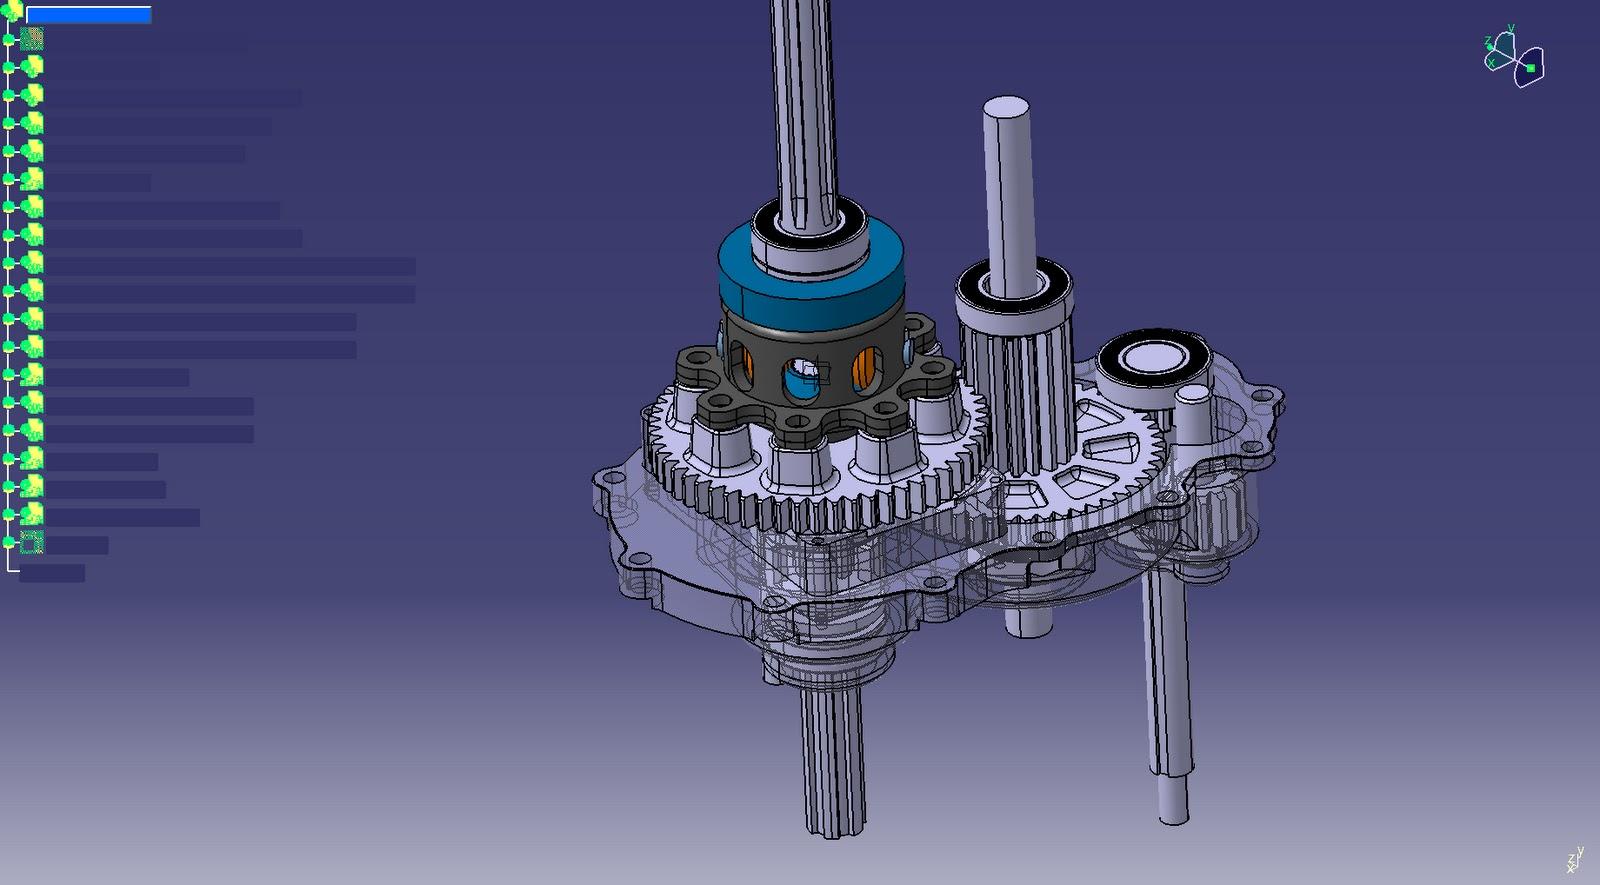 Wwu Baja Sae Gearbox Design Complete